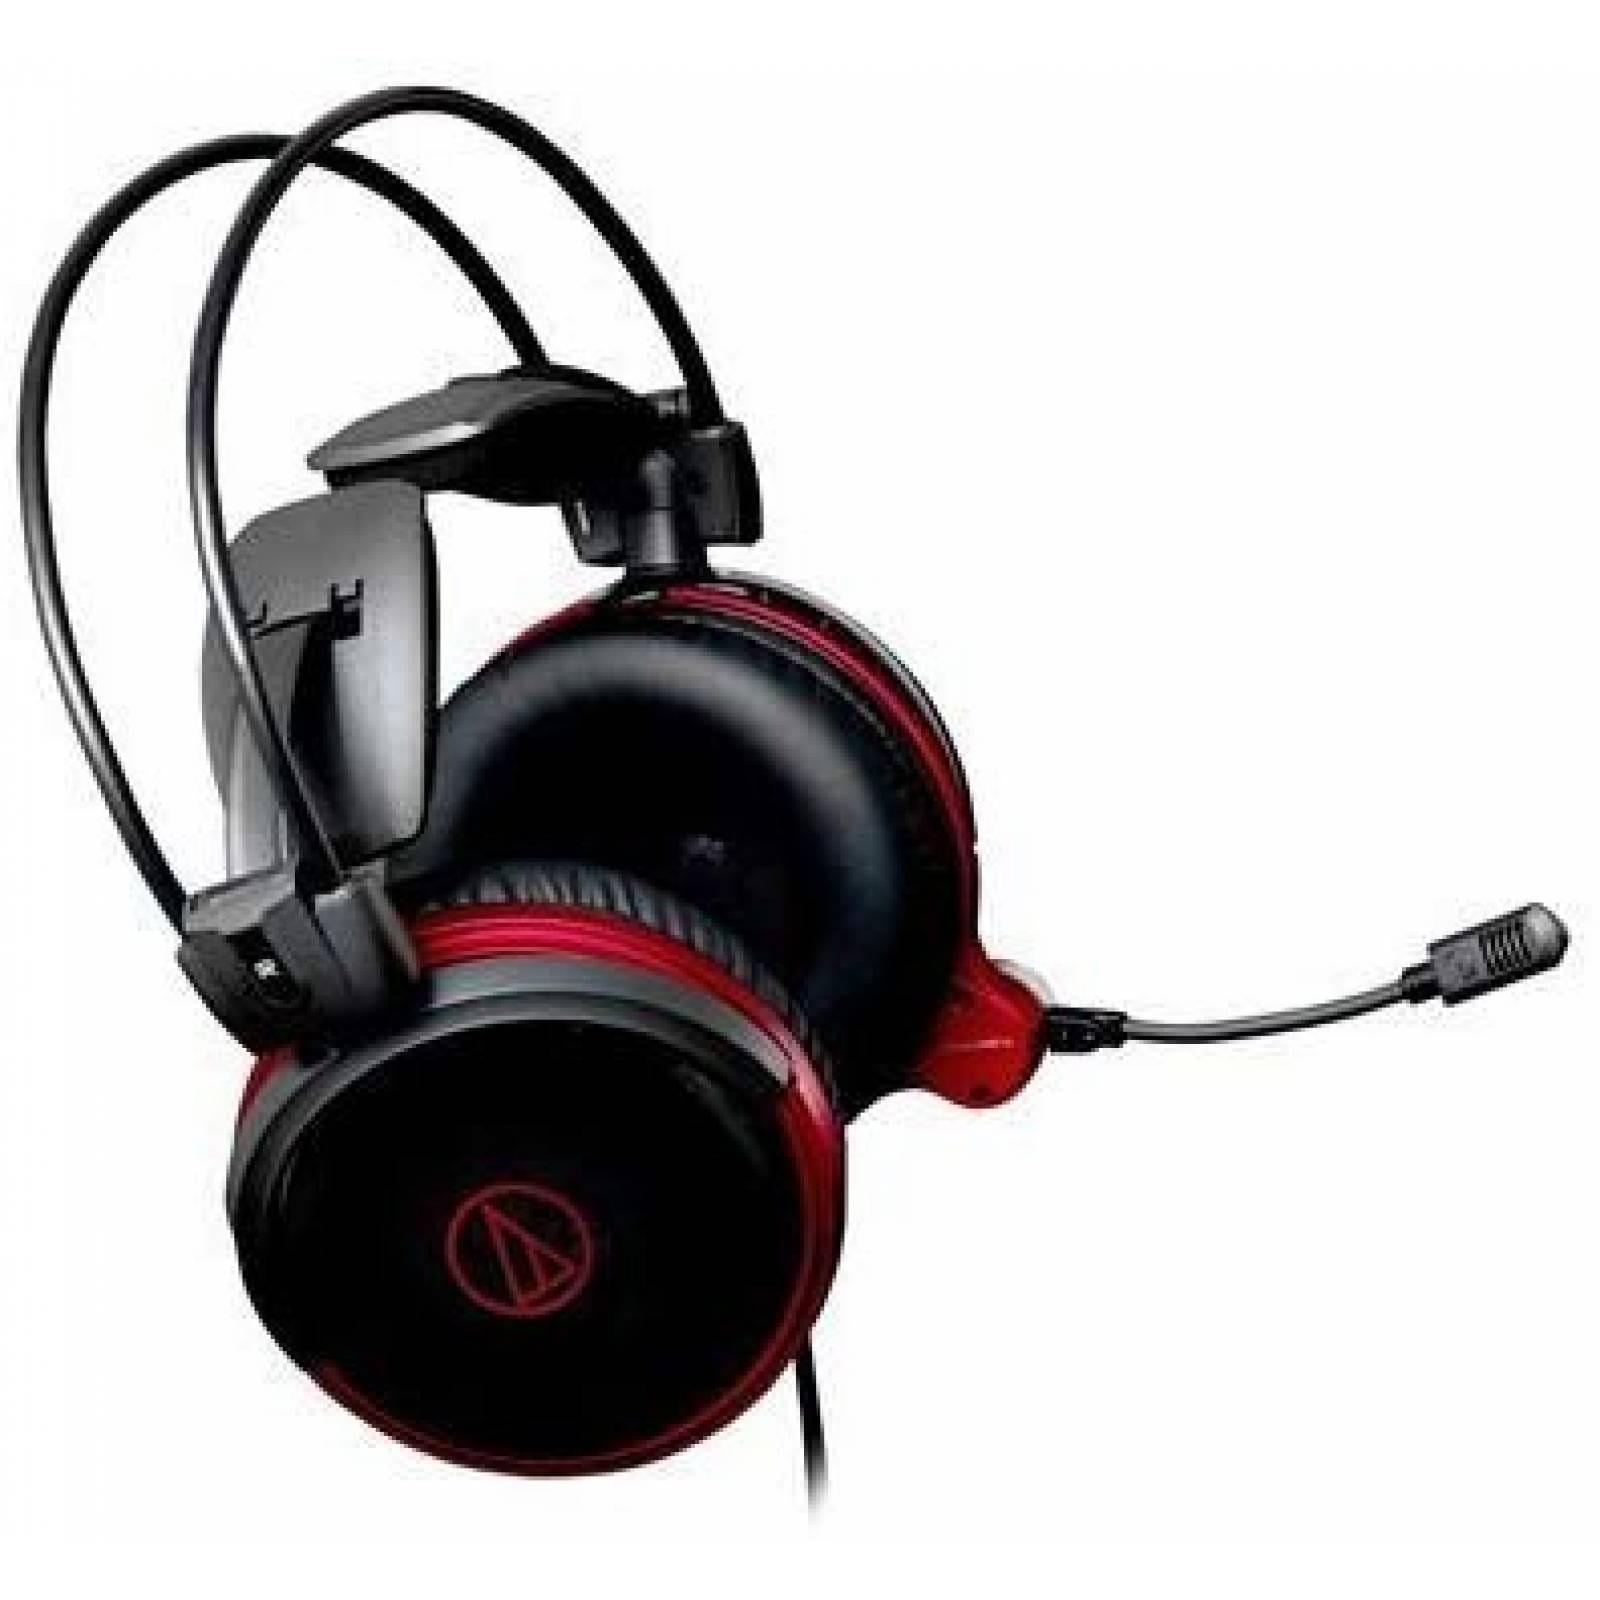 Diadema Gamer Audio-Technica ATH-AG1X cerrado -negro